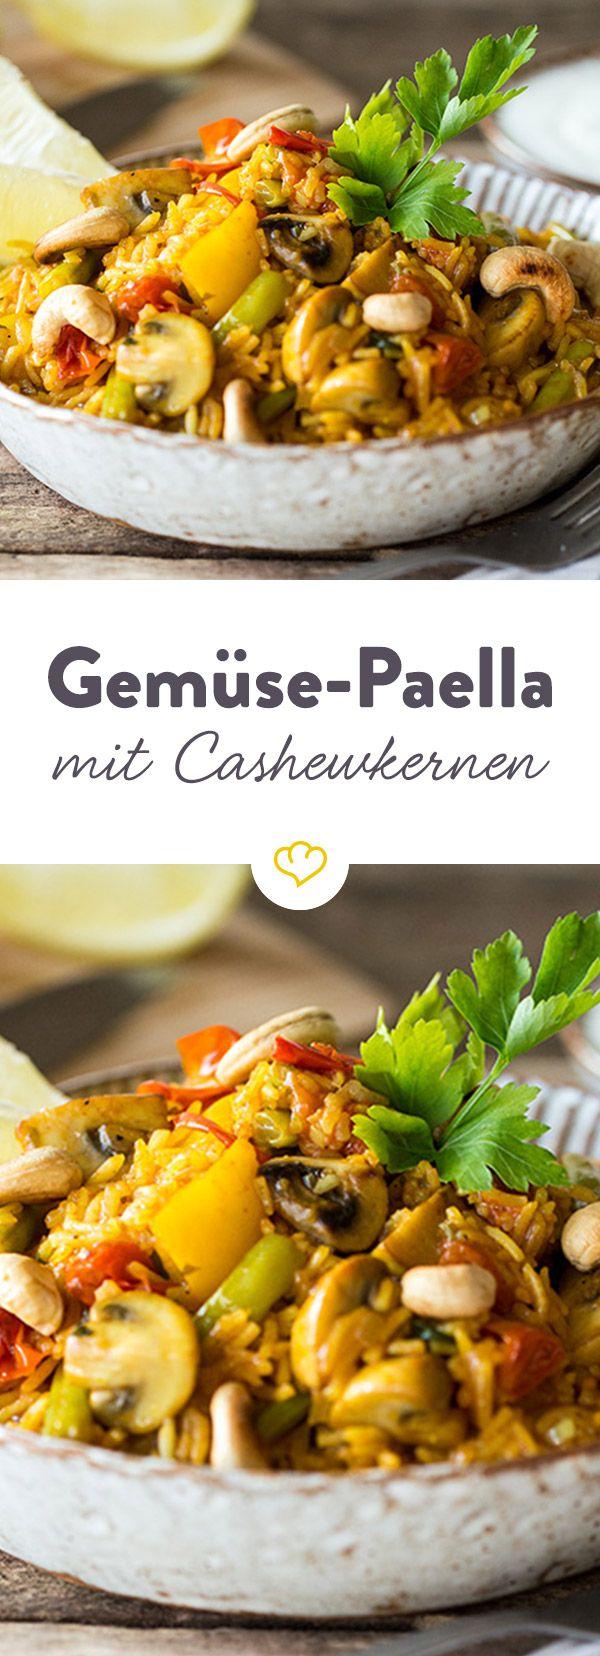 Bunte Gemüse-Paella mit gerösteten Cashewkernen #vegetarischerezepteschnell